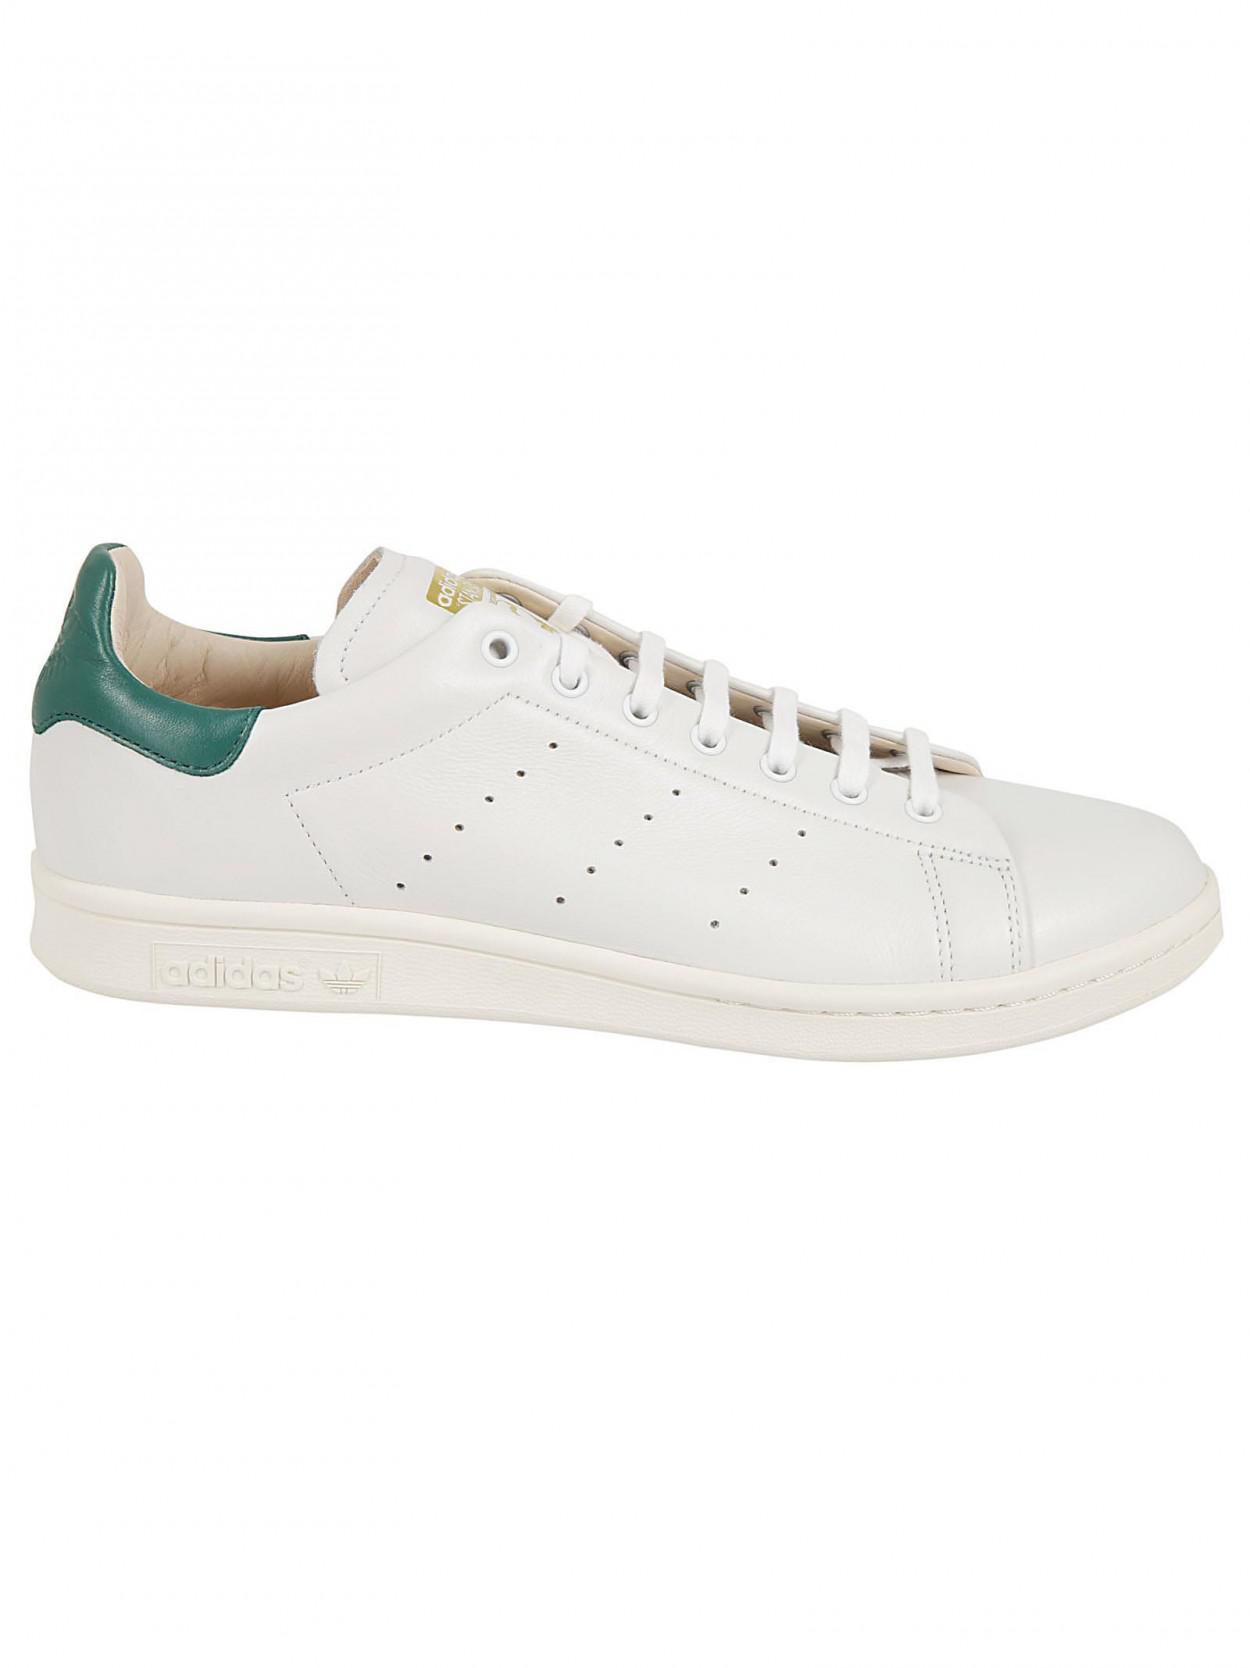 new arrival cc175 d94b5 adidas Originals. Men s White ADIDAS ORIGINALS Trainer STAN SMITH RECON  BIANCA